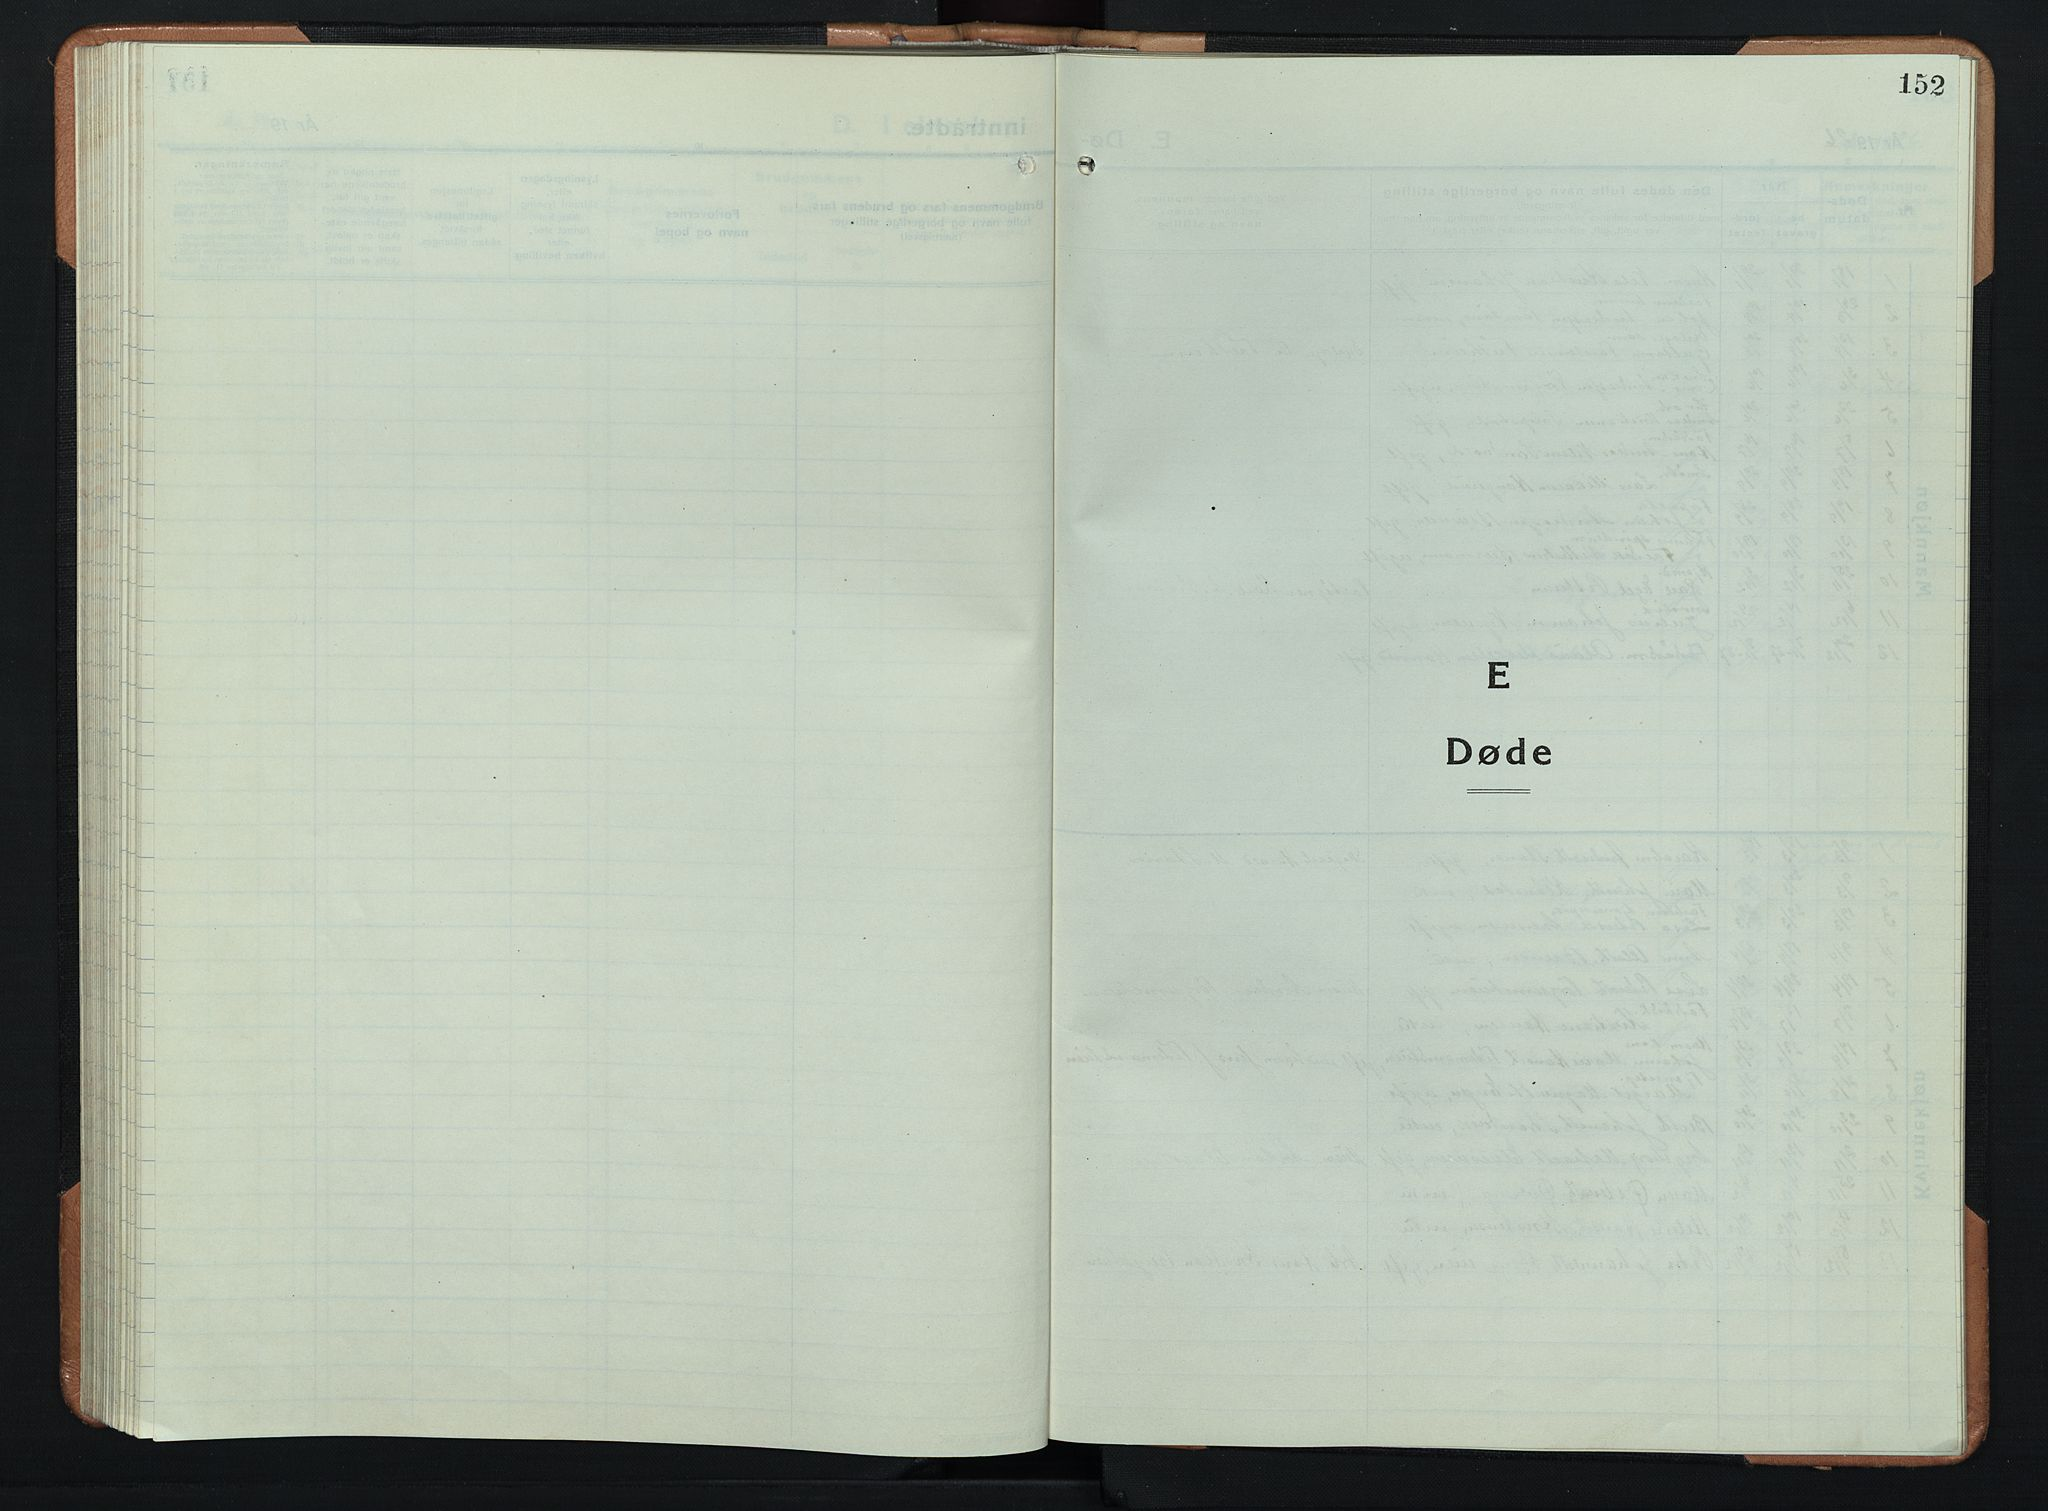 SAH, Søndre Land prestekontor, L/L0008: Klokkerbok nr. 8, 1926-1950, s. 152